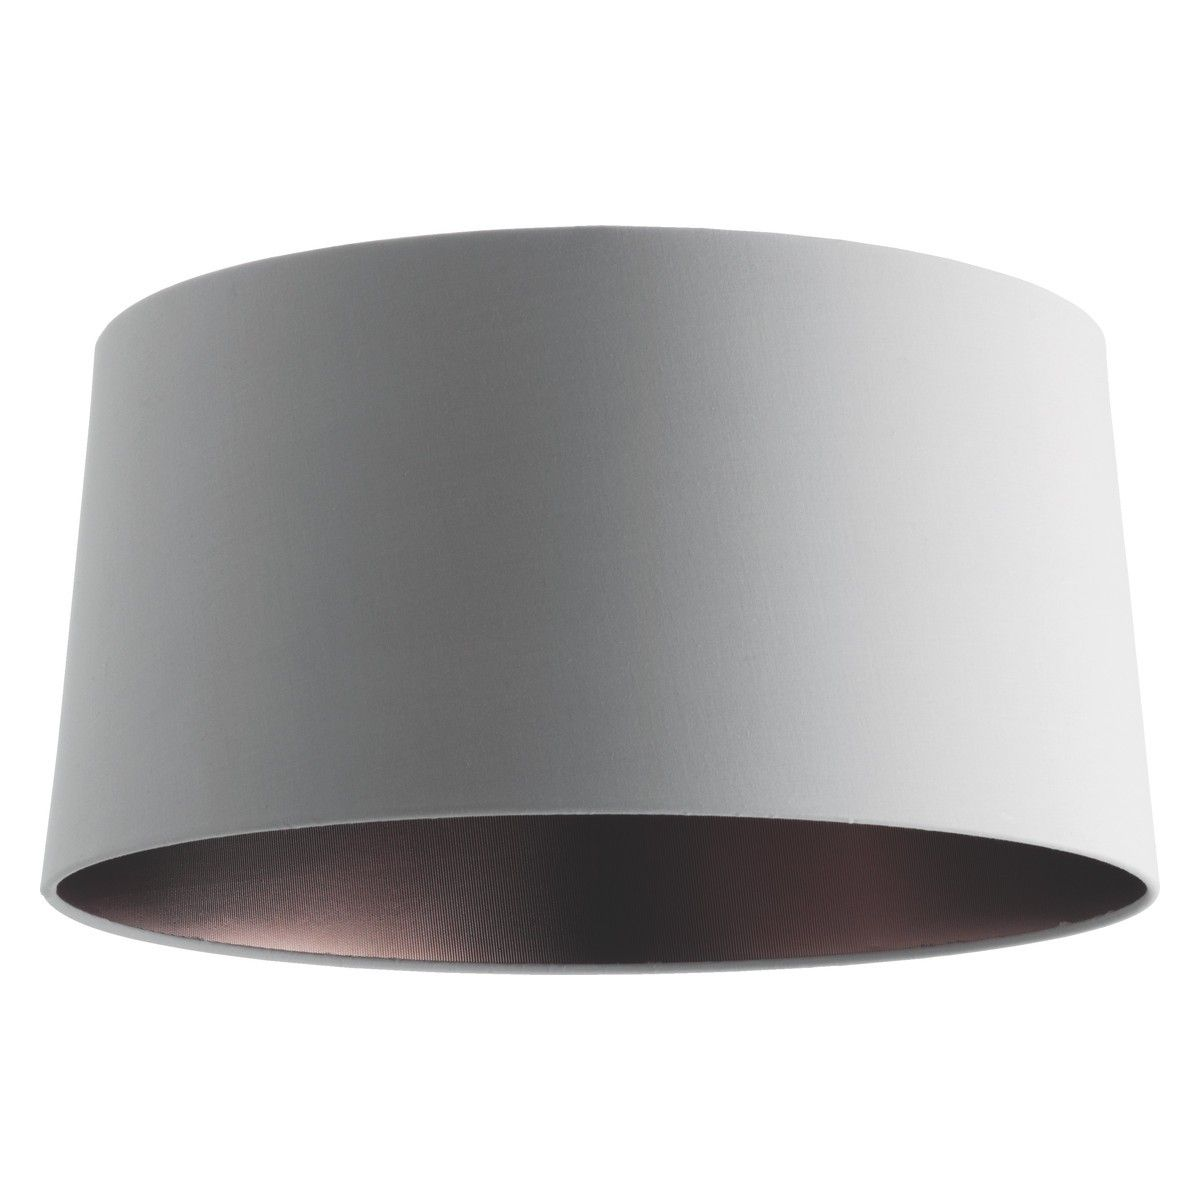 GRANDE Grey/bronze Medium Tapered Lampshade D38 X H19cm